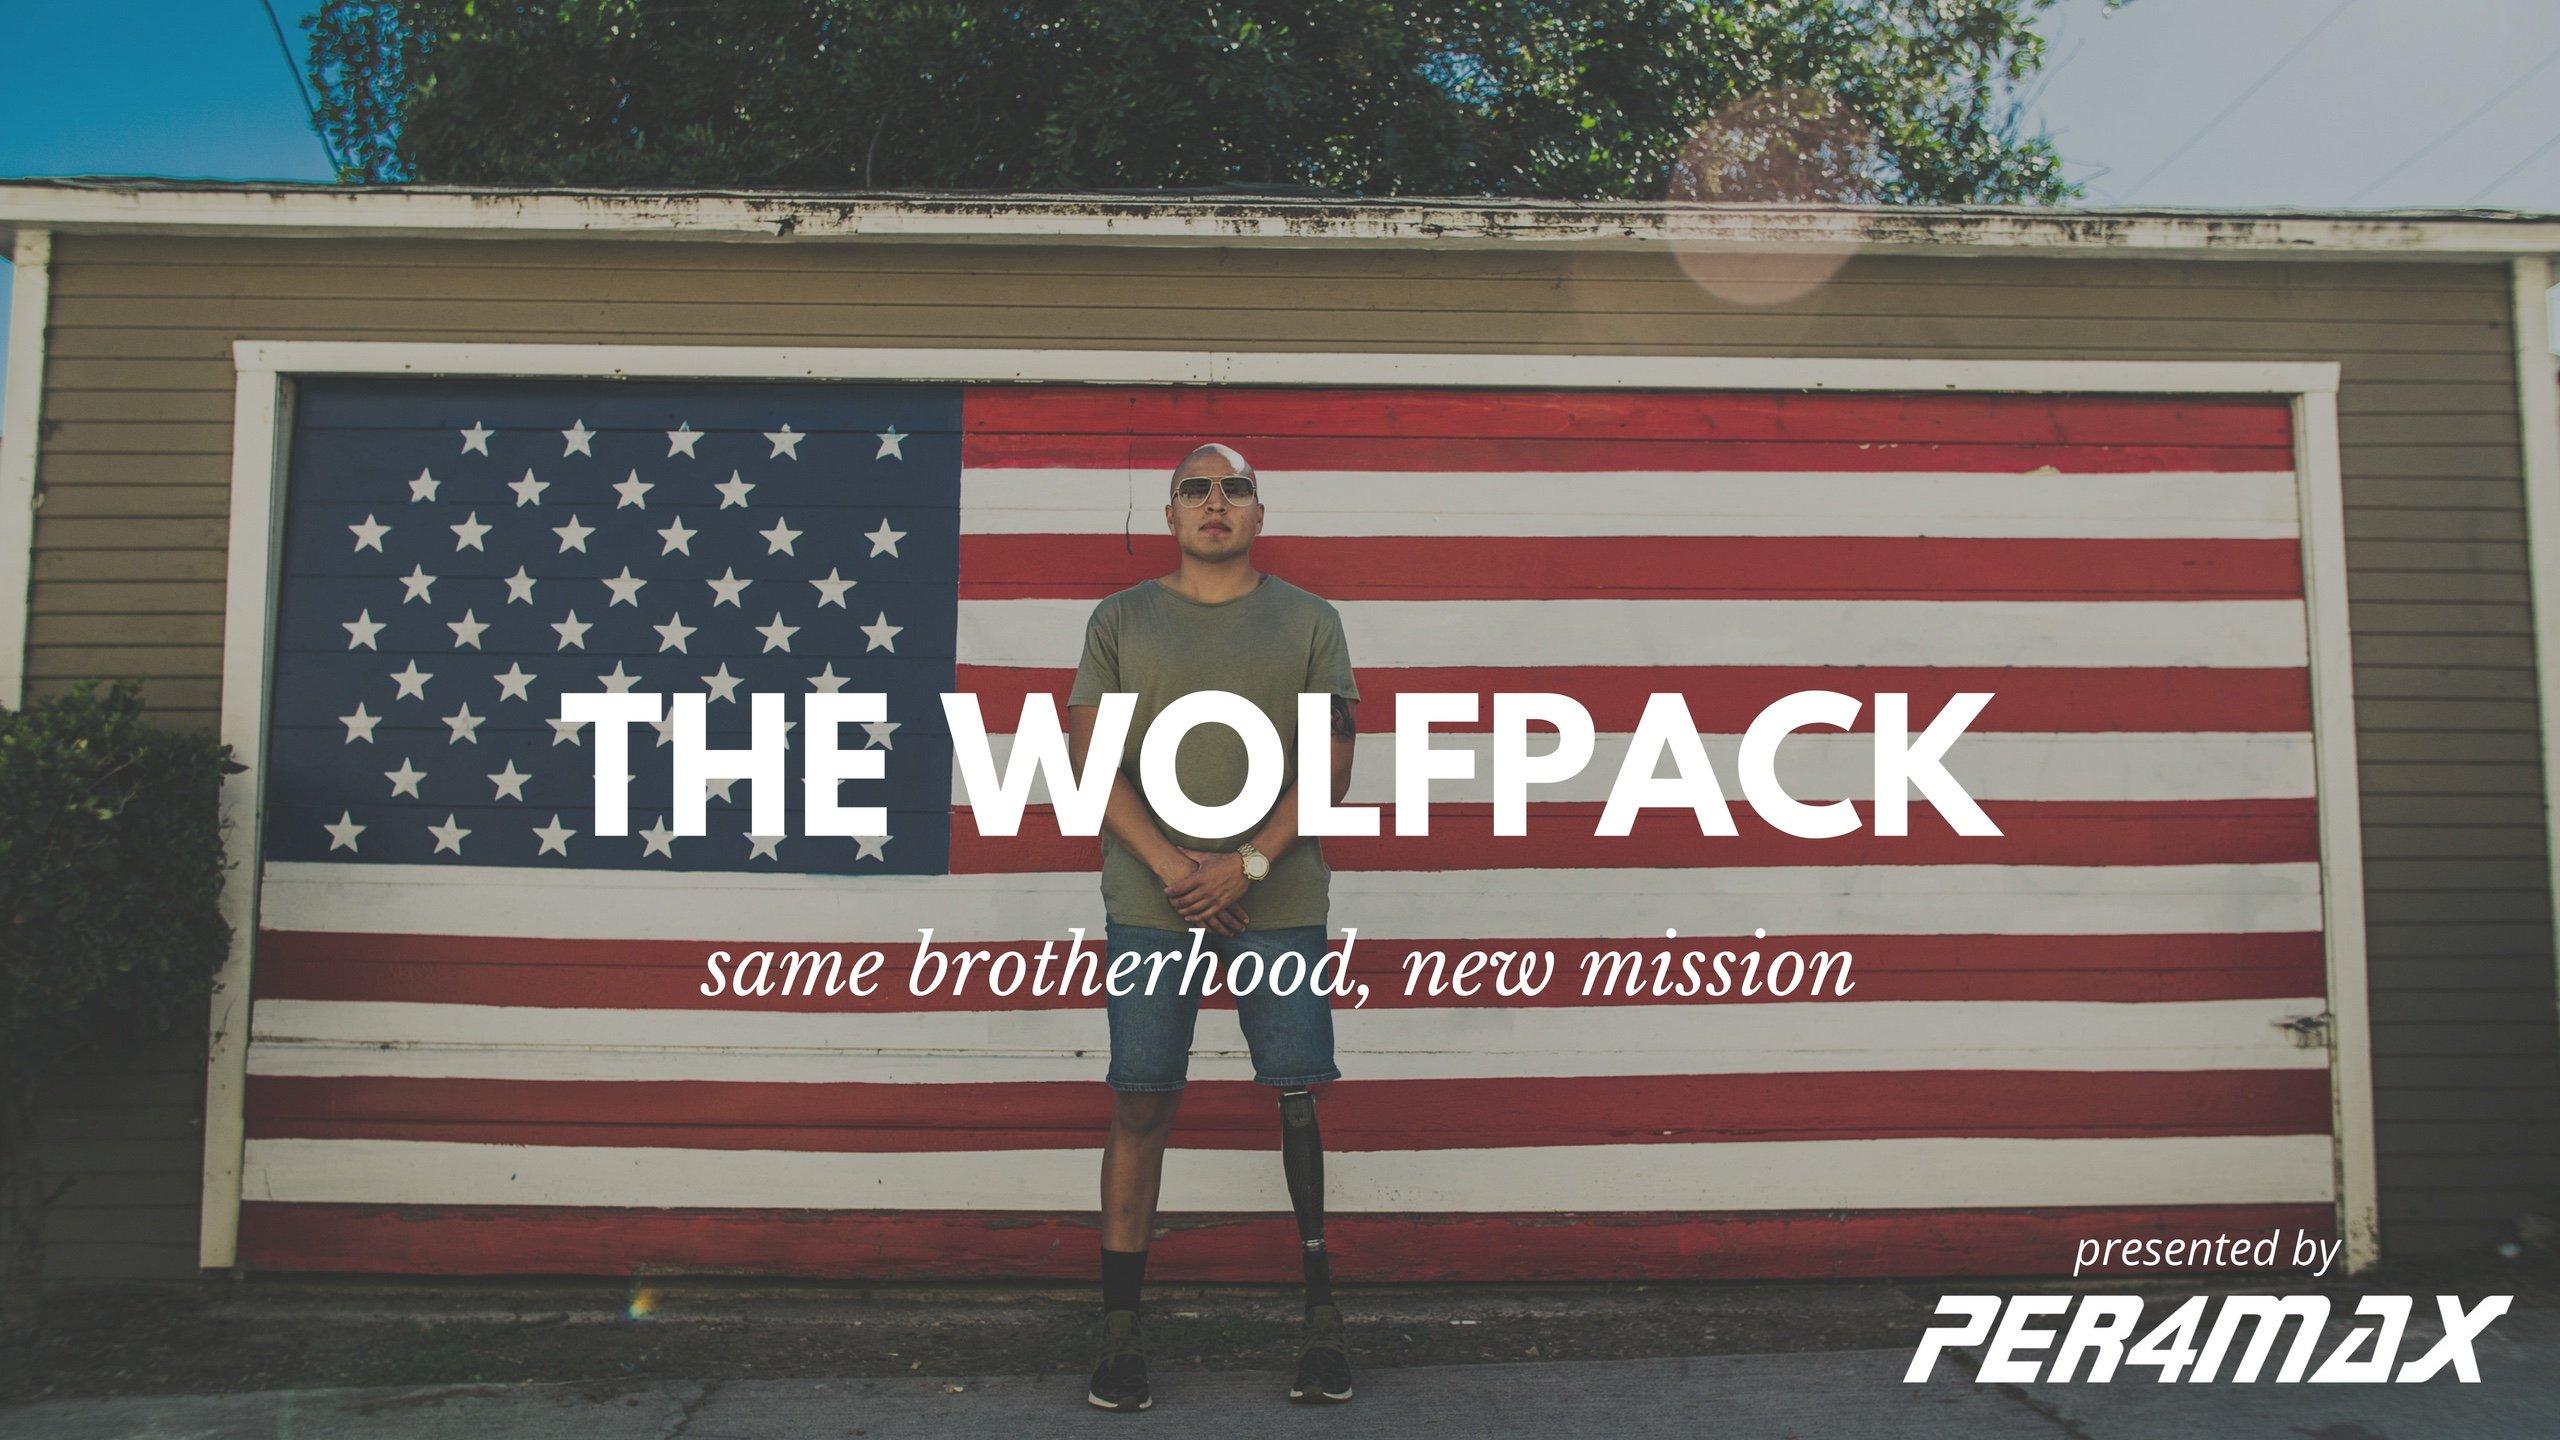 The Wolfpack - Wheelchair basketball short film